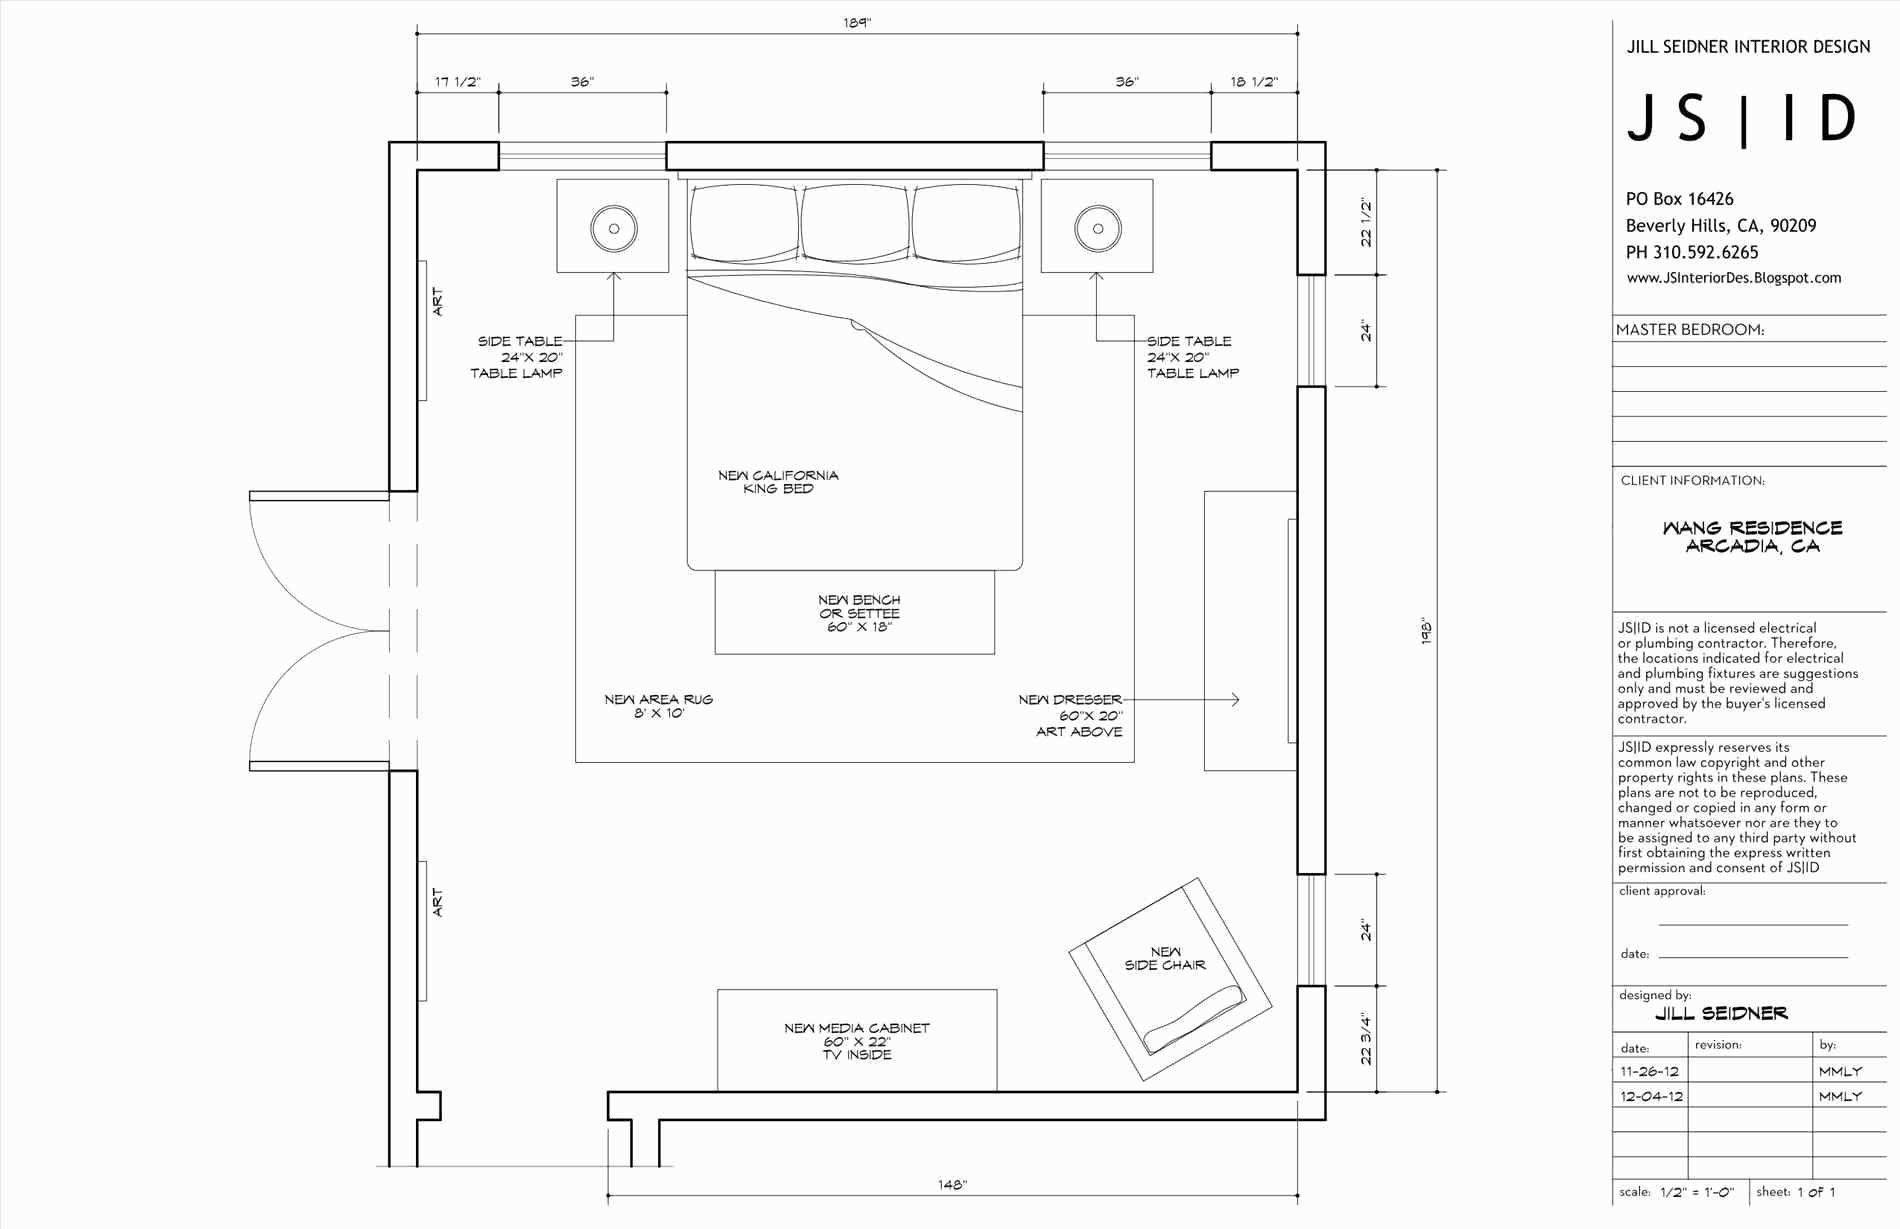 20x20 Master Suite Beautiful Excellent Floor Plans for